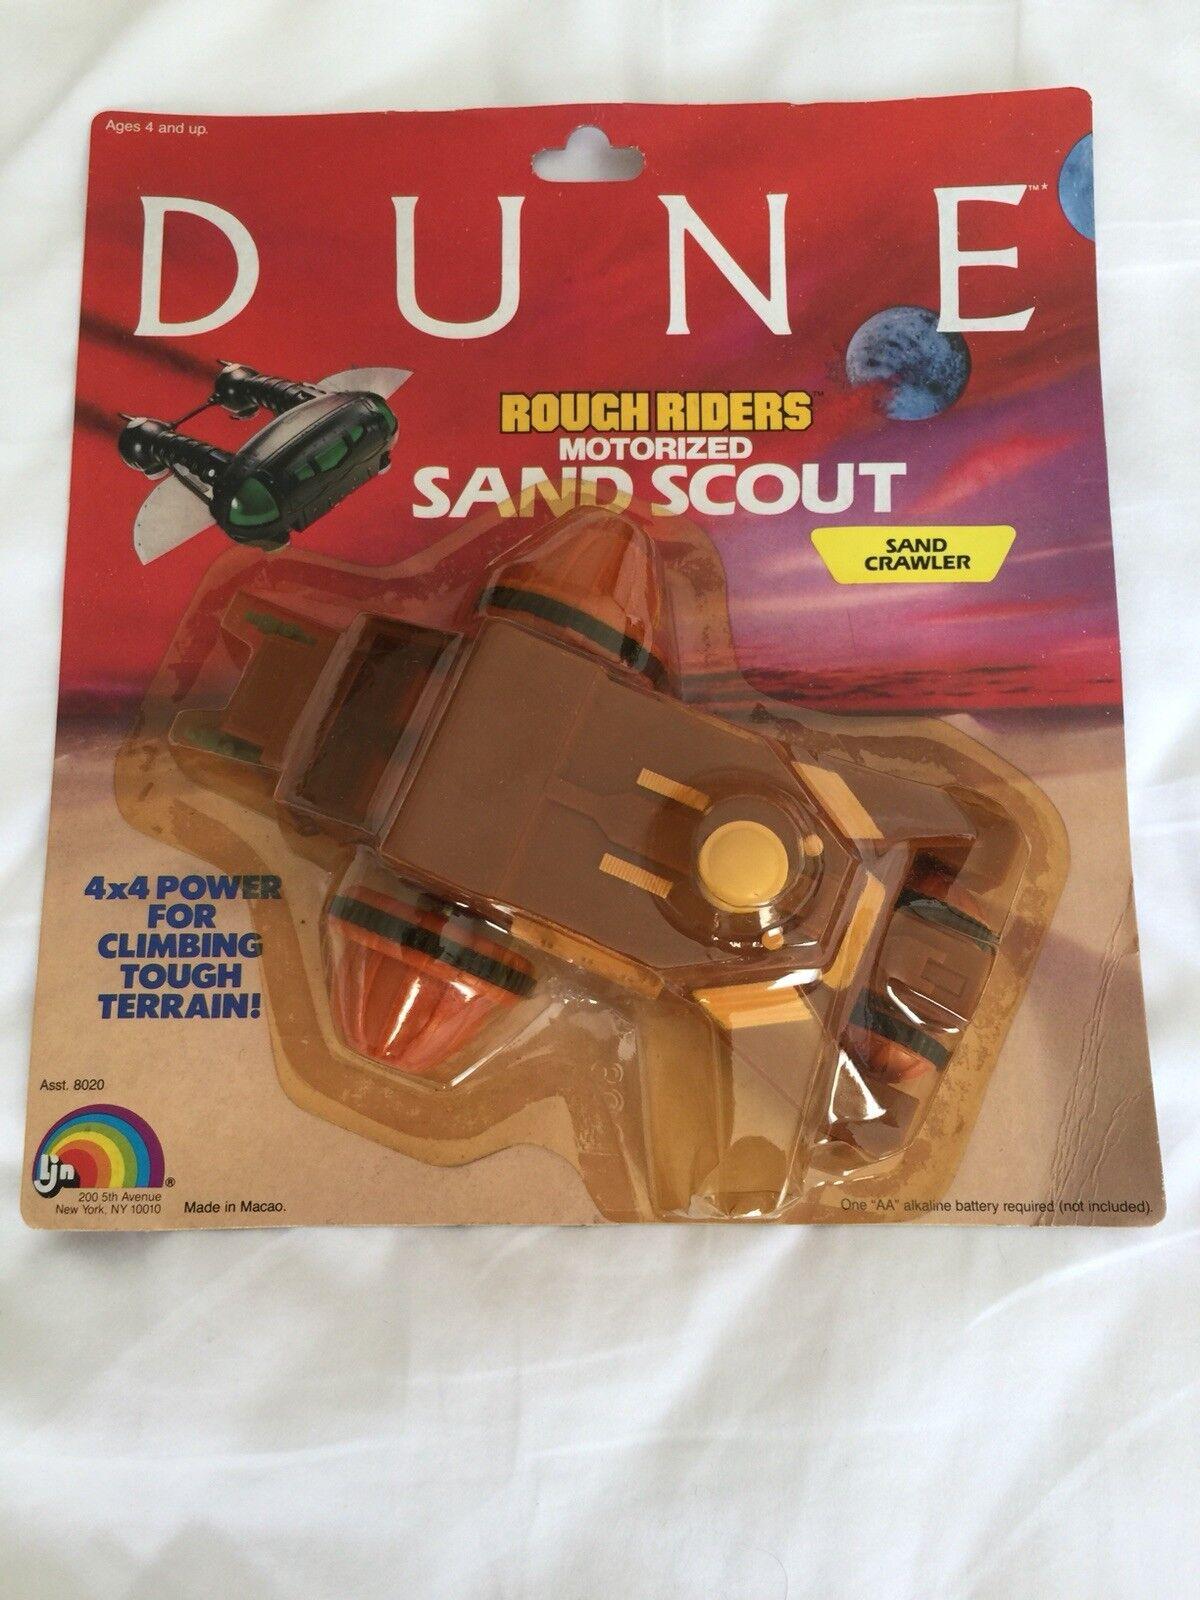 Ljn Dune Rough Riders Sand Crawler